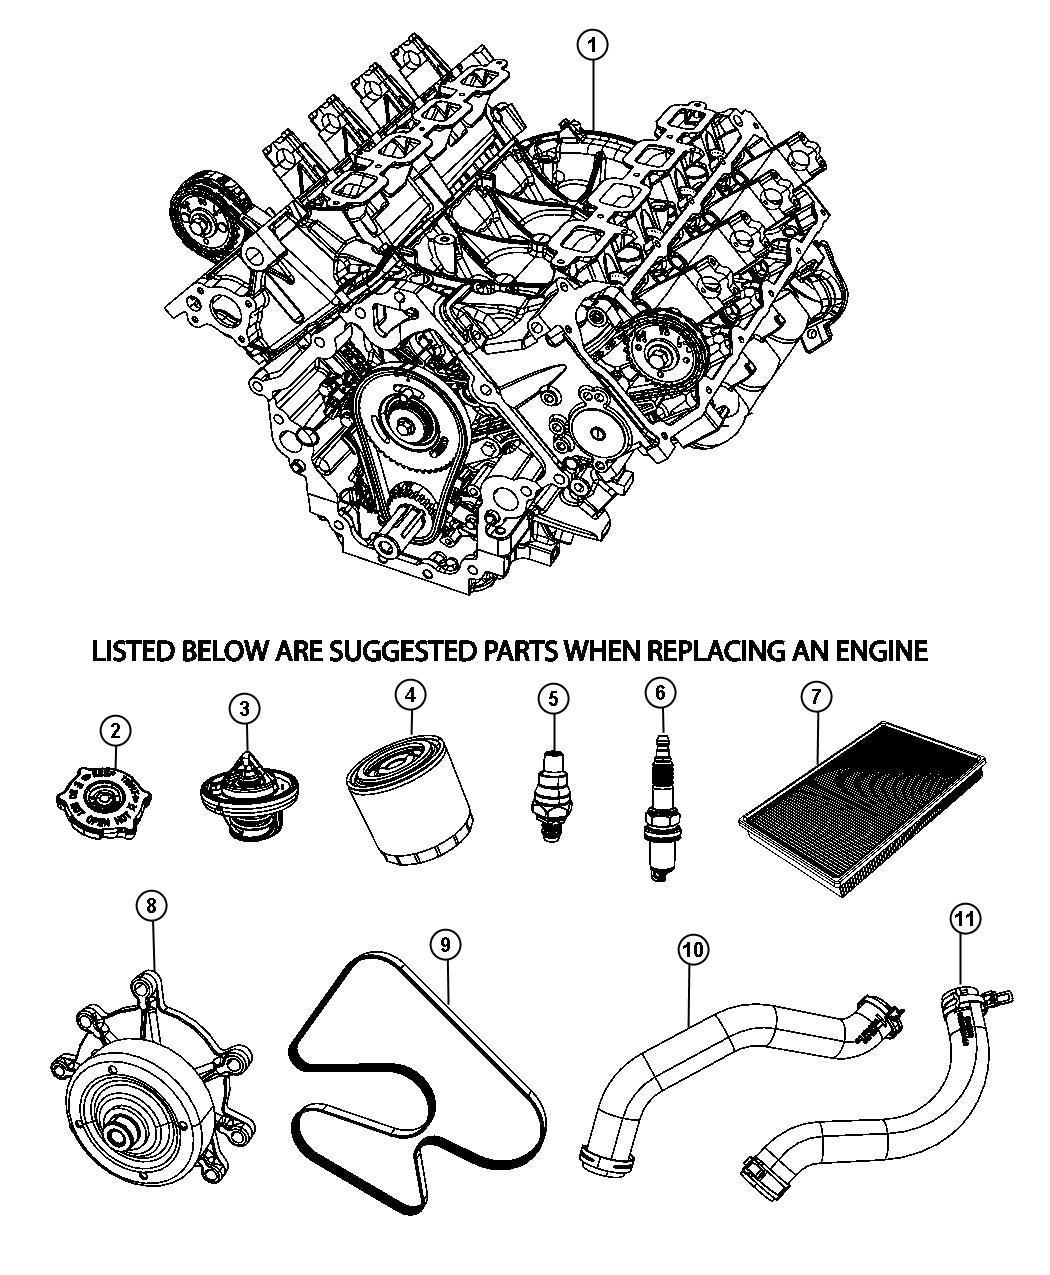 2007 Dodge Dakota Belt. Accessory drive, serpentine. With